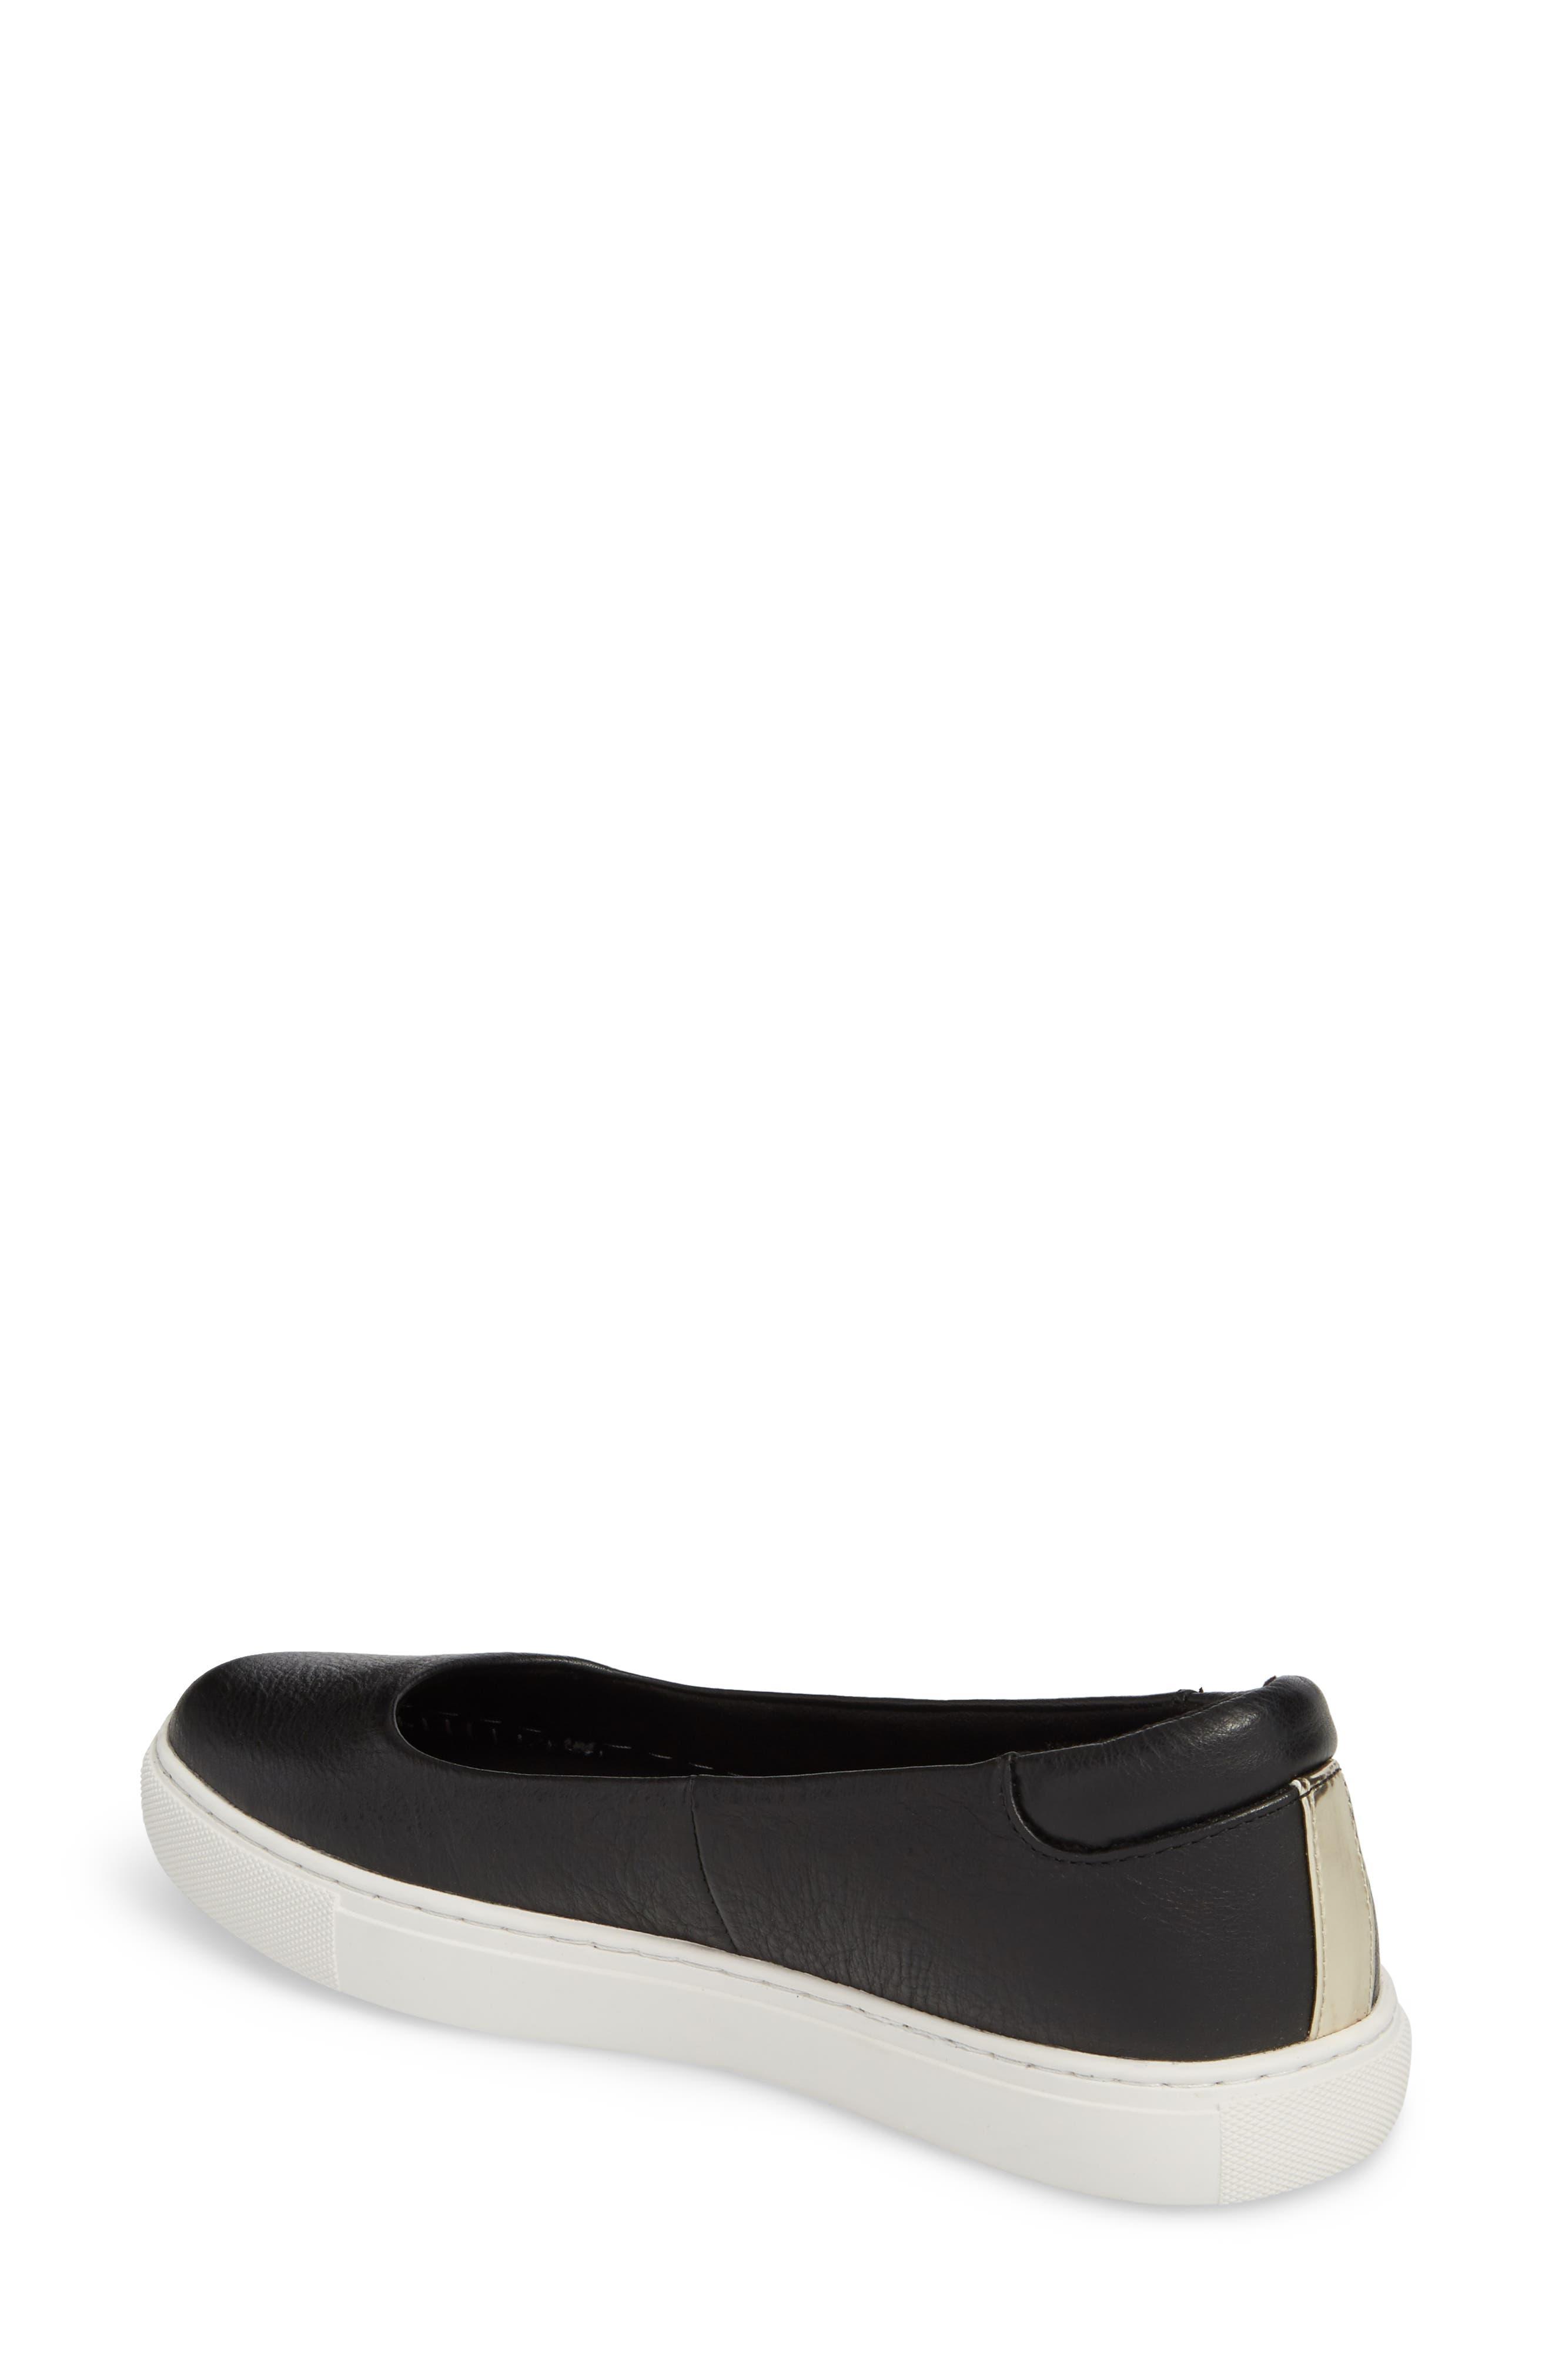 Kassie Flat,                             Alternate thumbnail 2, color,                             Black Leather